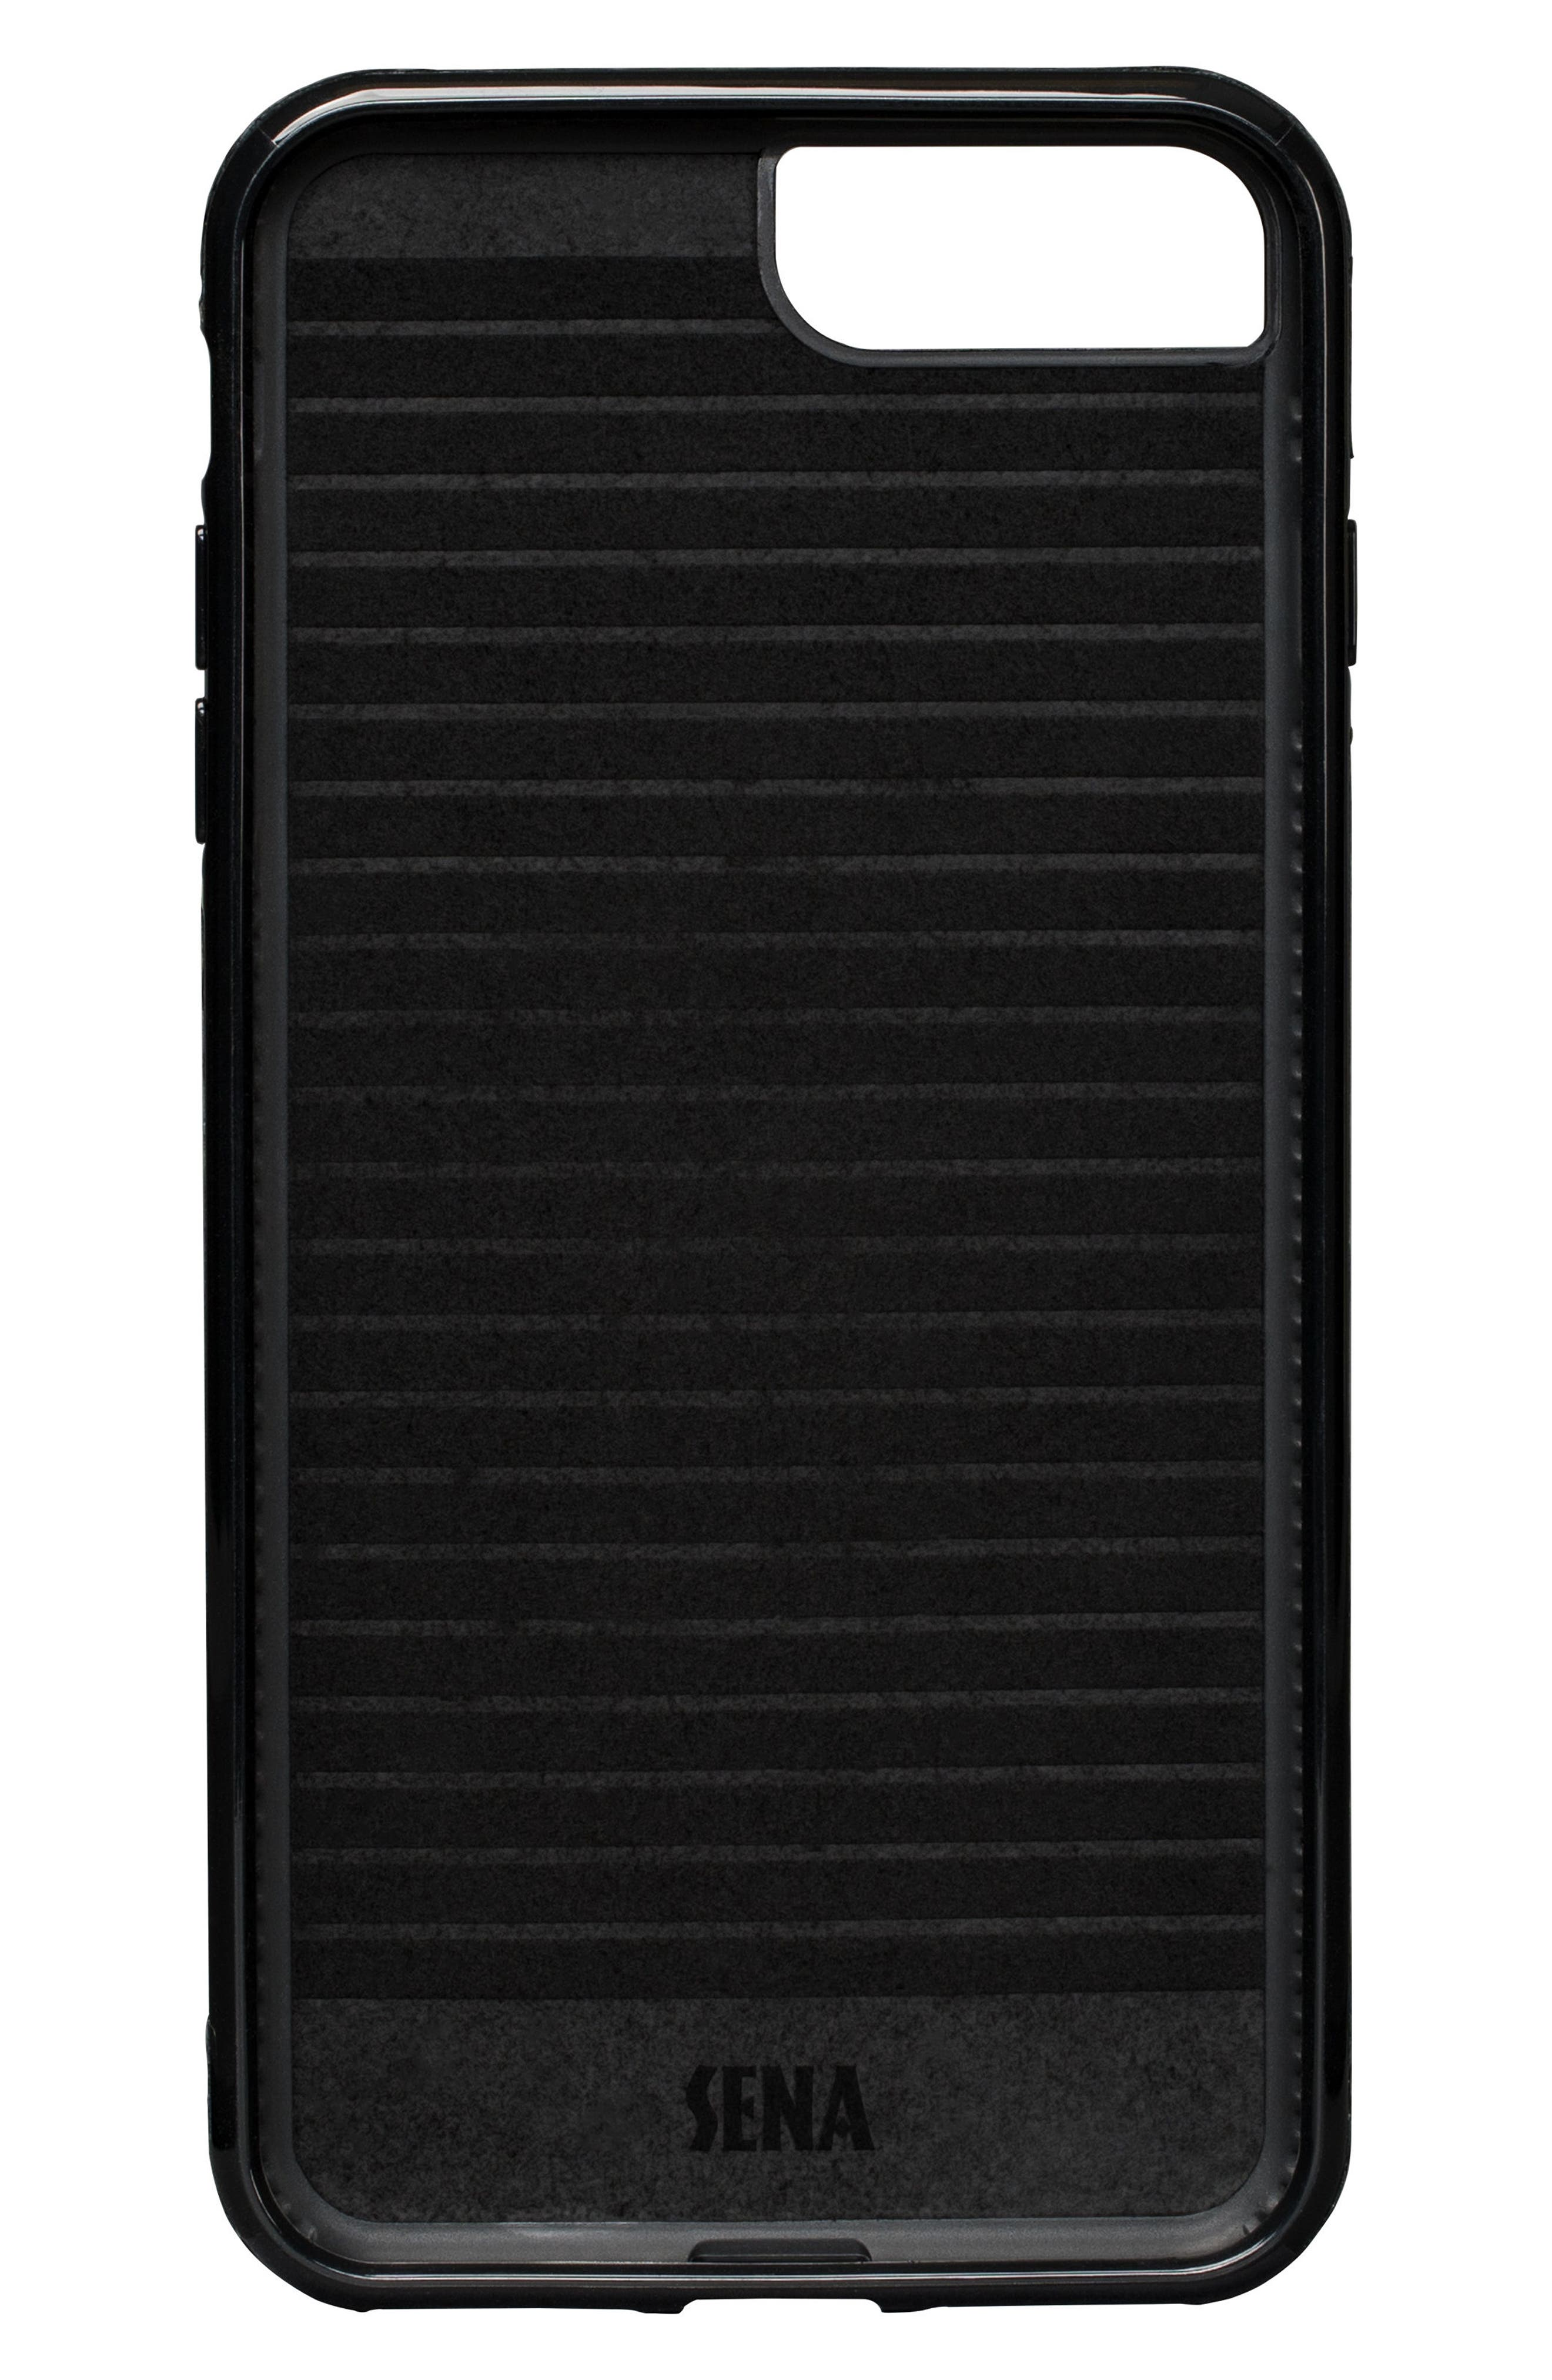 SENA,                             Bence Lugano iPhone 7/8 Plus Wallet Case,                             Alternate thumbnail 2, color,                             001